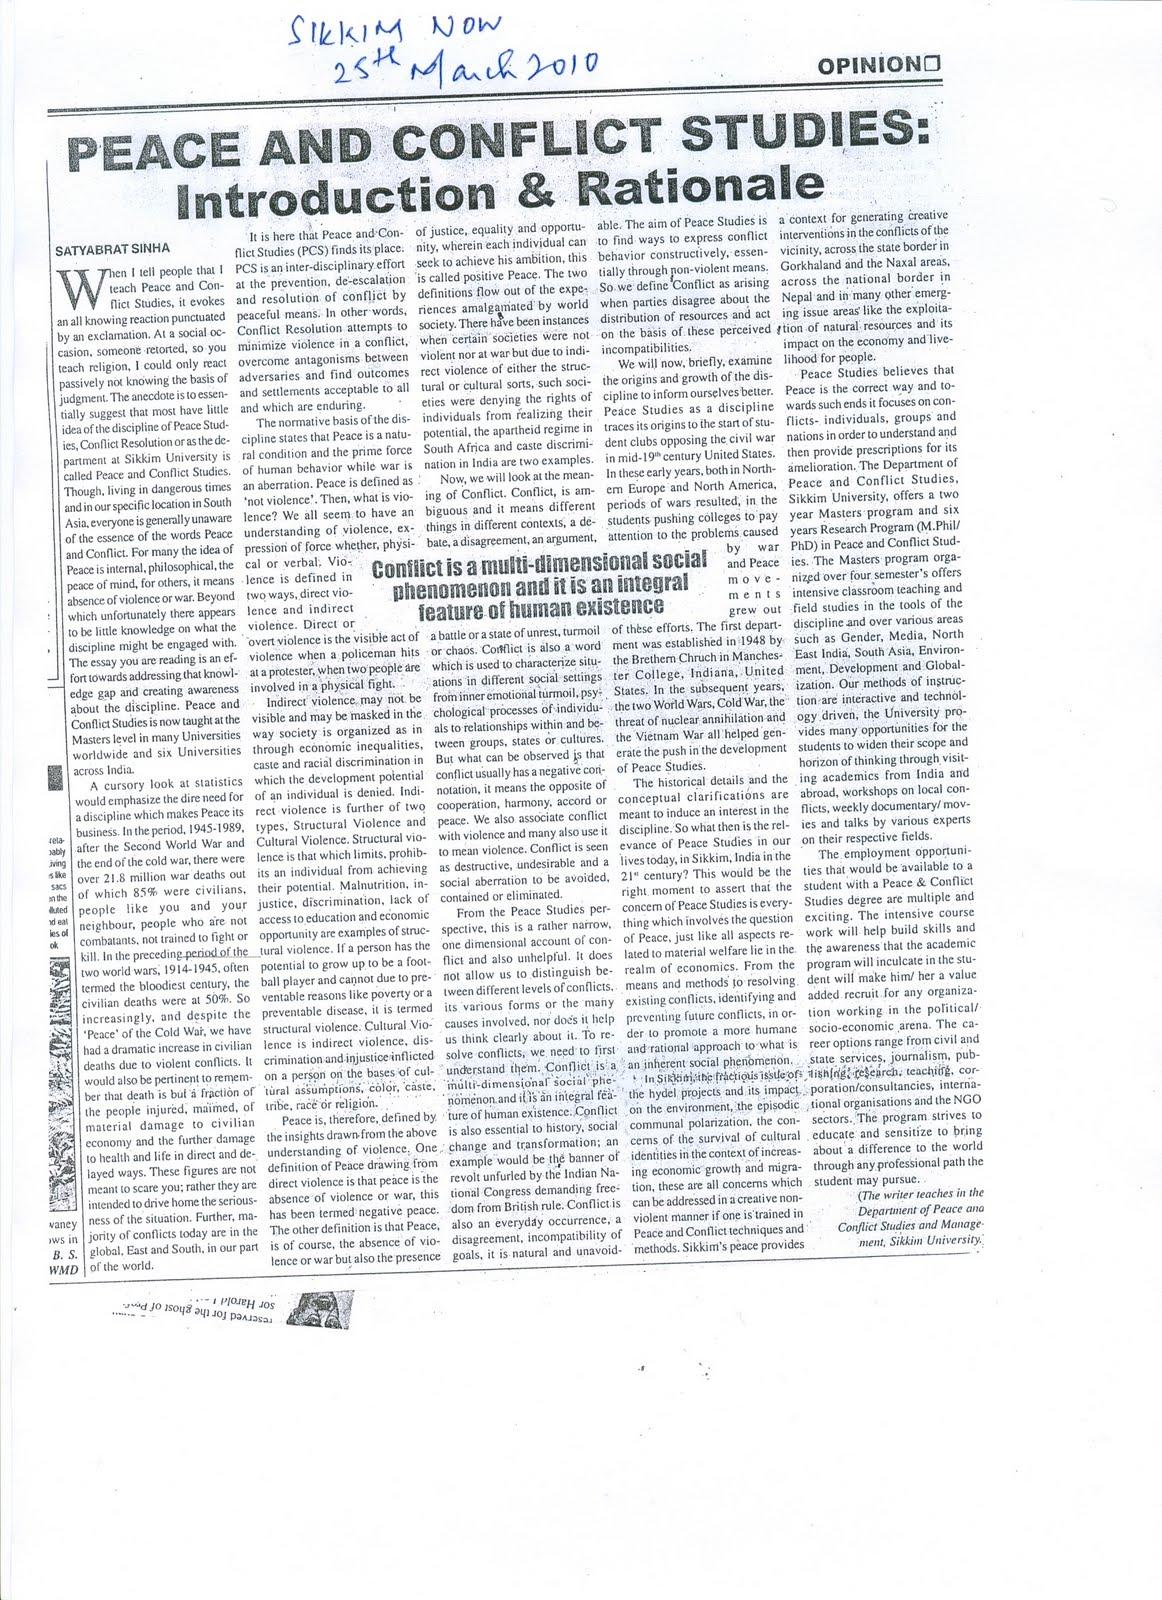 Analysis Essay Thesis Essay On Discipline Makes Life Easier Self Discipline  Essays   Words Healthy Living Essay also Thesis Essay Essay On Discipline Makes Life Easier Short Essay On Self  Sample Essay Papers